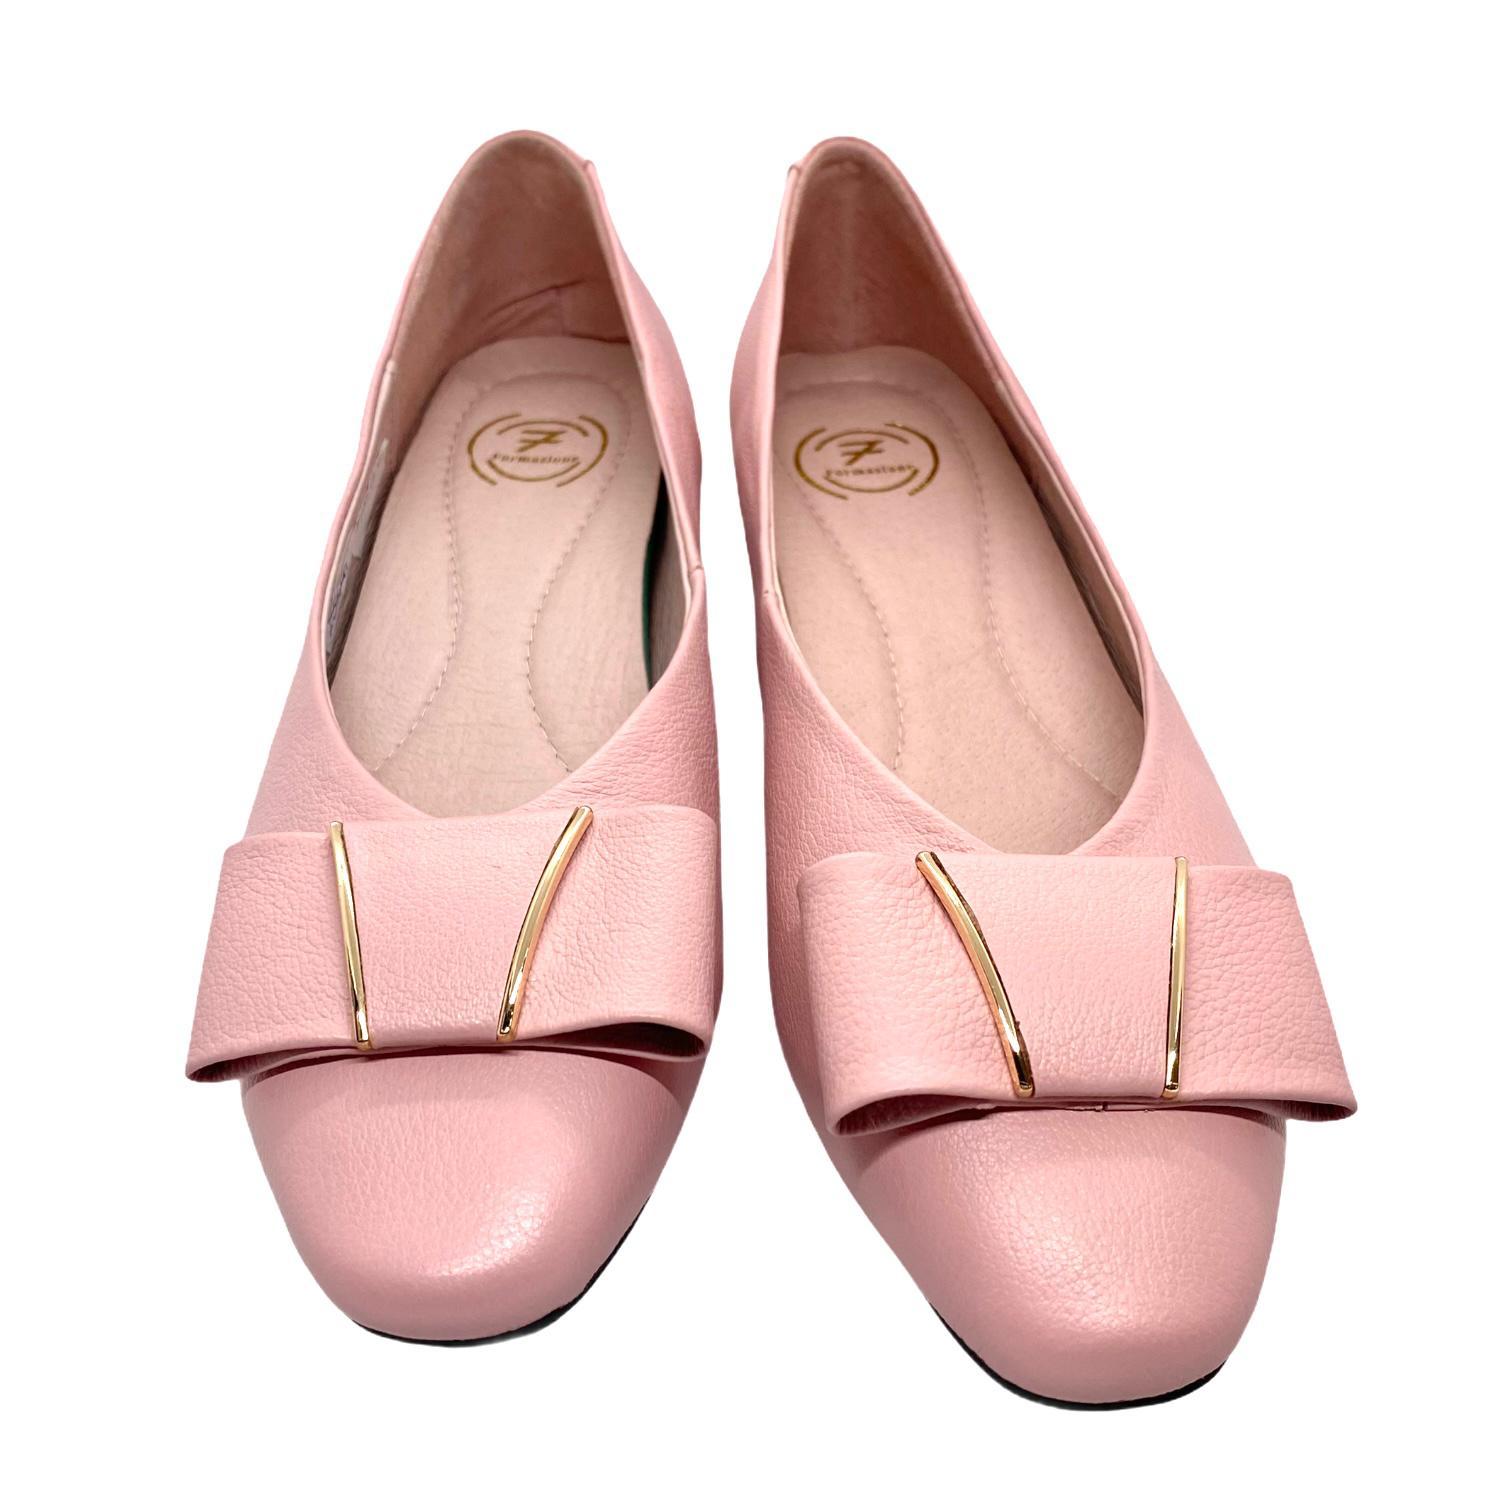 Balerini roz cu accesoriu tip funda